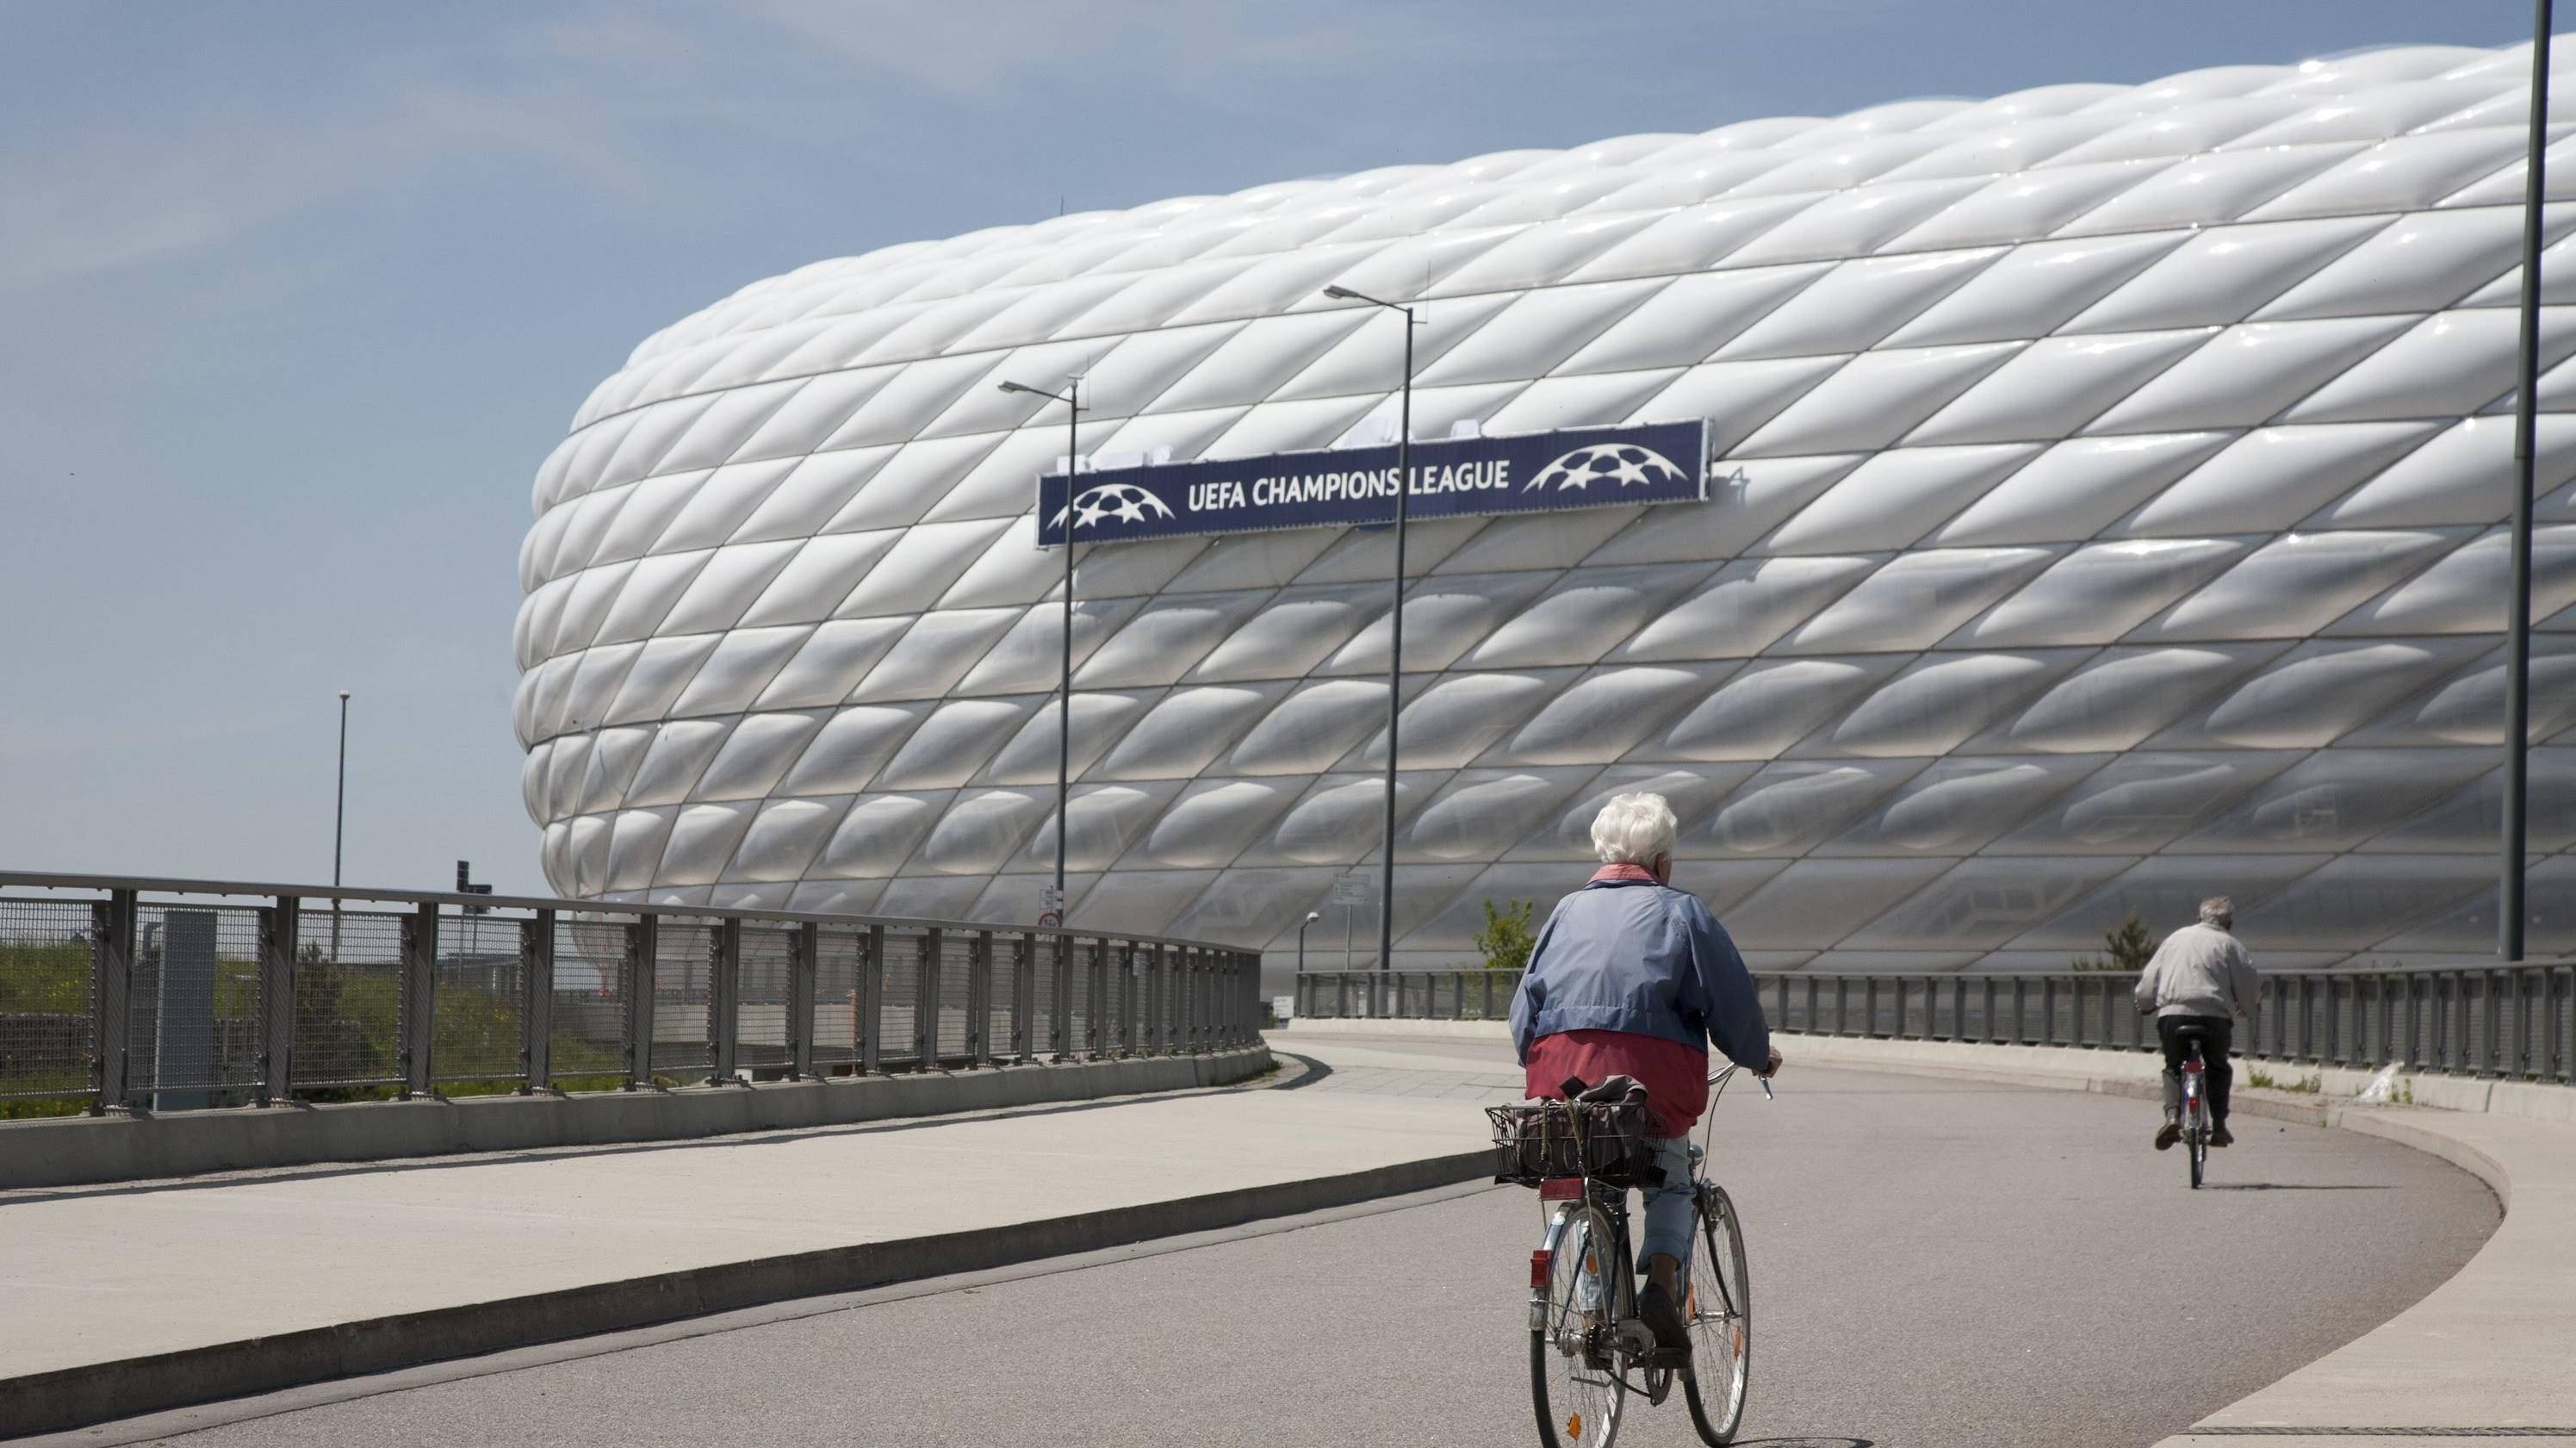 Die Münchner Arena vor dem Champions-League-Finale 2012